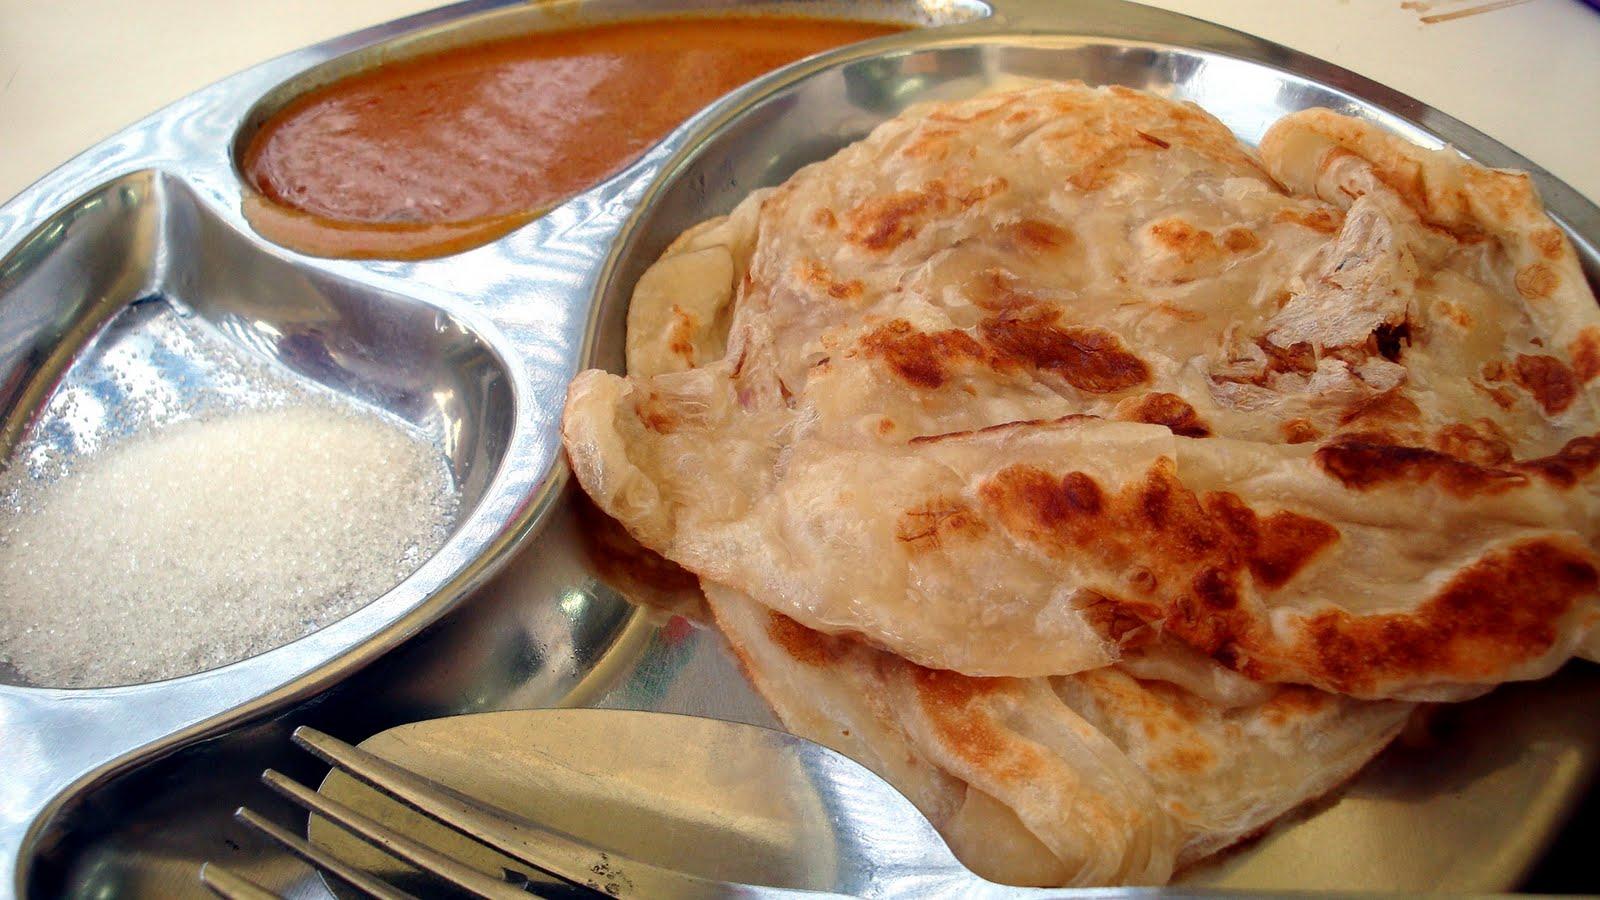 roti prata curry sugar flat bread dough plain egg singapore malaysia street food traditional hawker